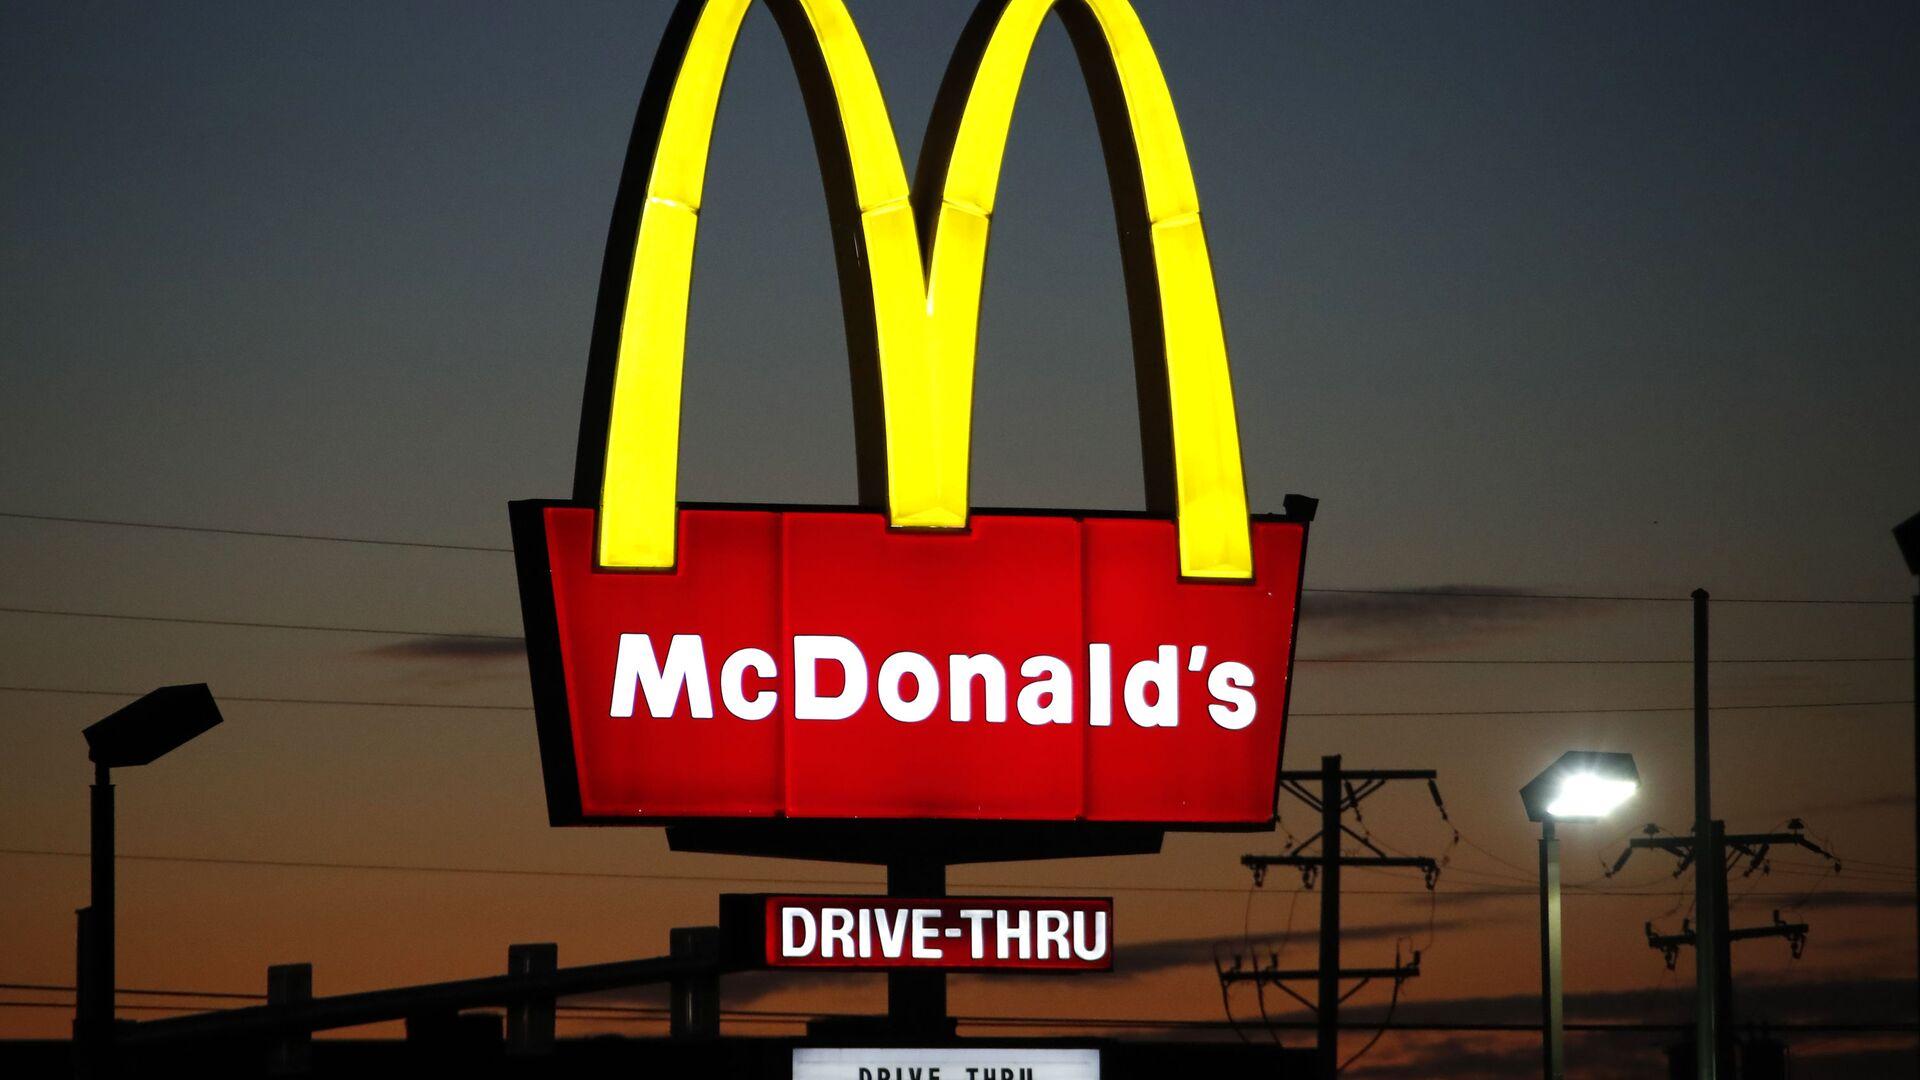 Logo de la cadena de restaurantes de comida rápida McDonald's - Sputnik Mundo, 1920, 19.04.2021